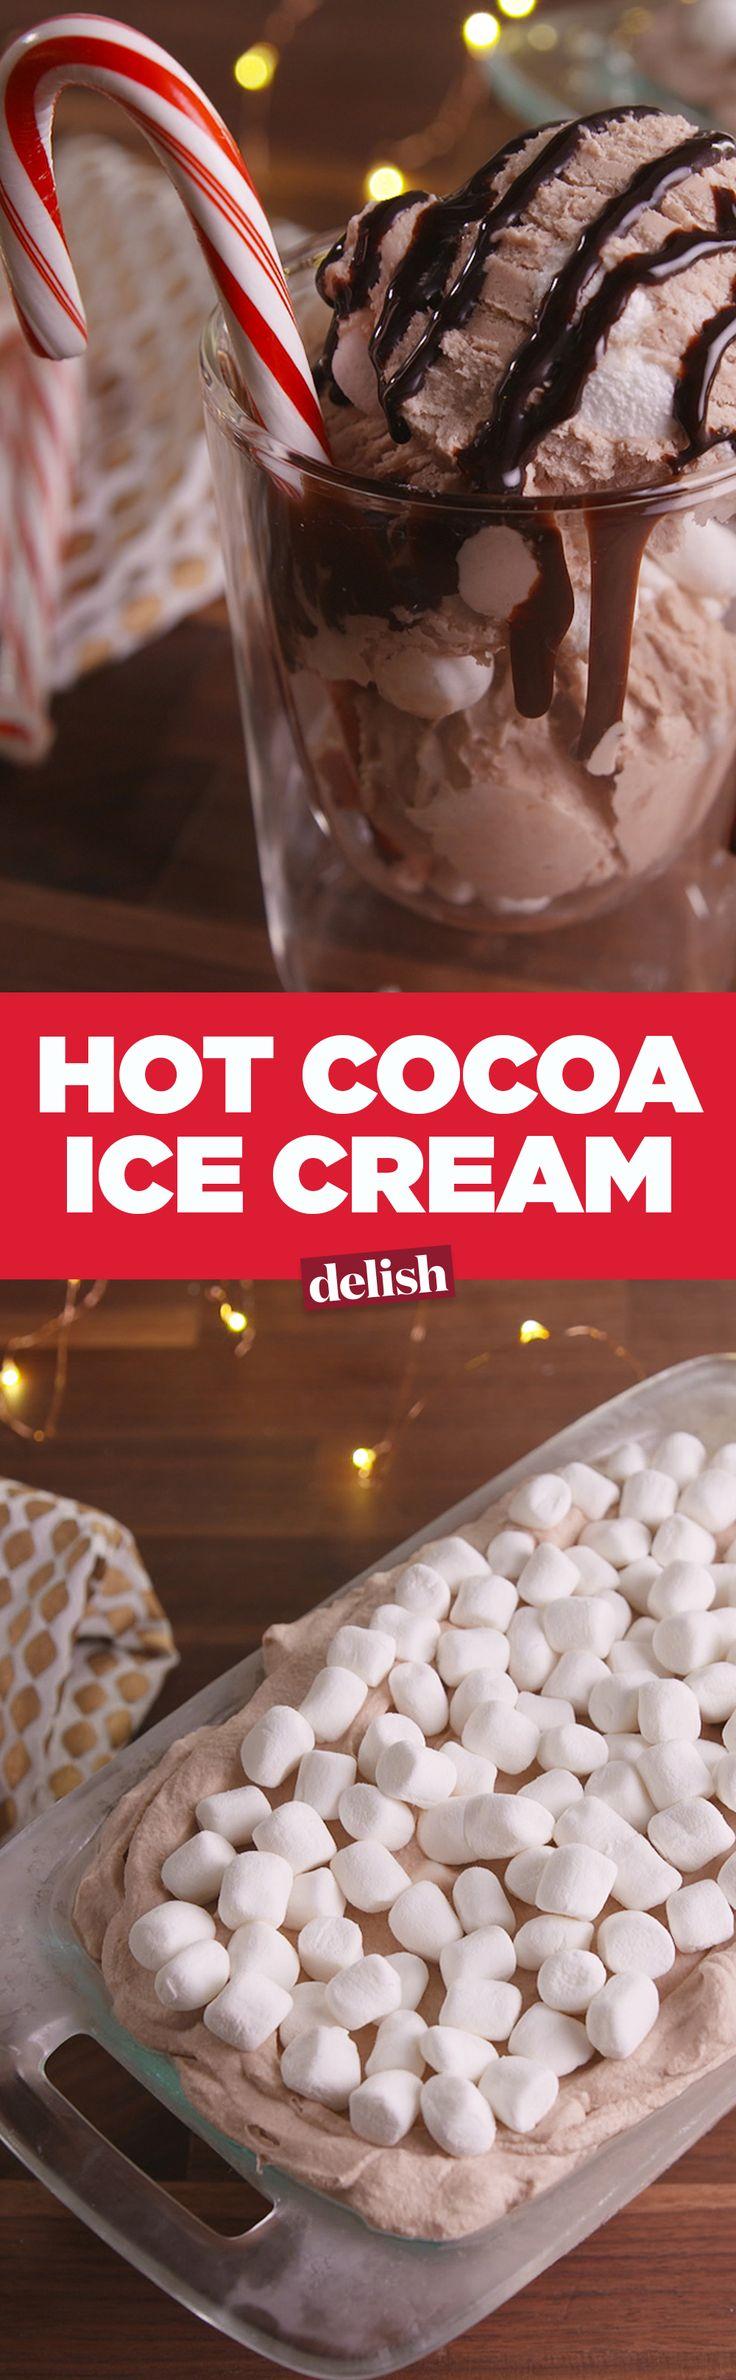 ice cream recipes desserts with ice cream recipes rh icecreamrecipesninsei blogspot com